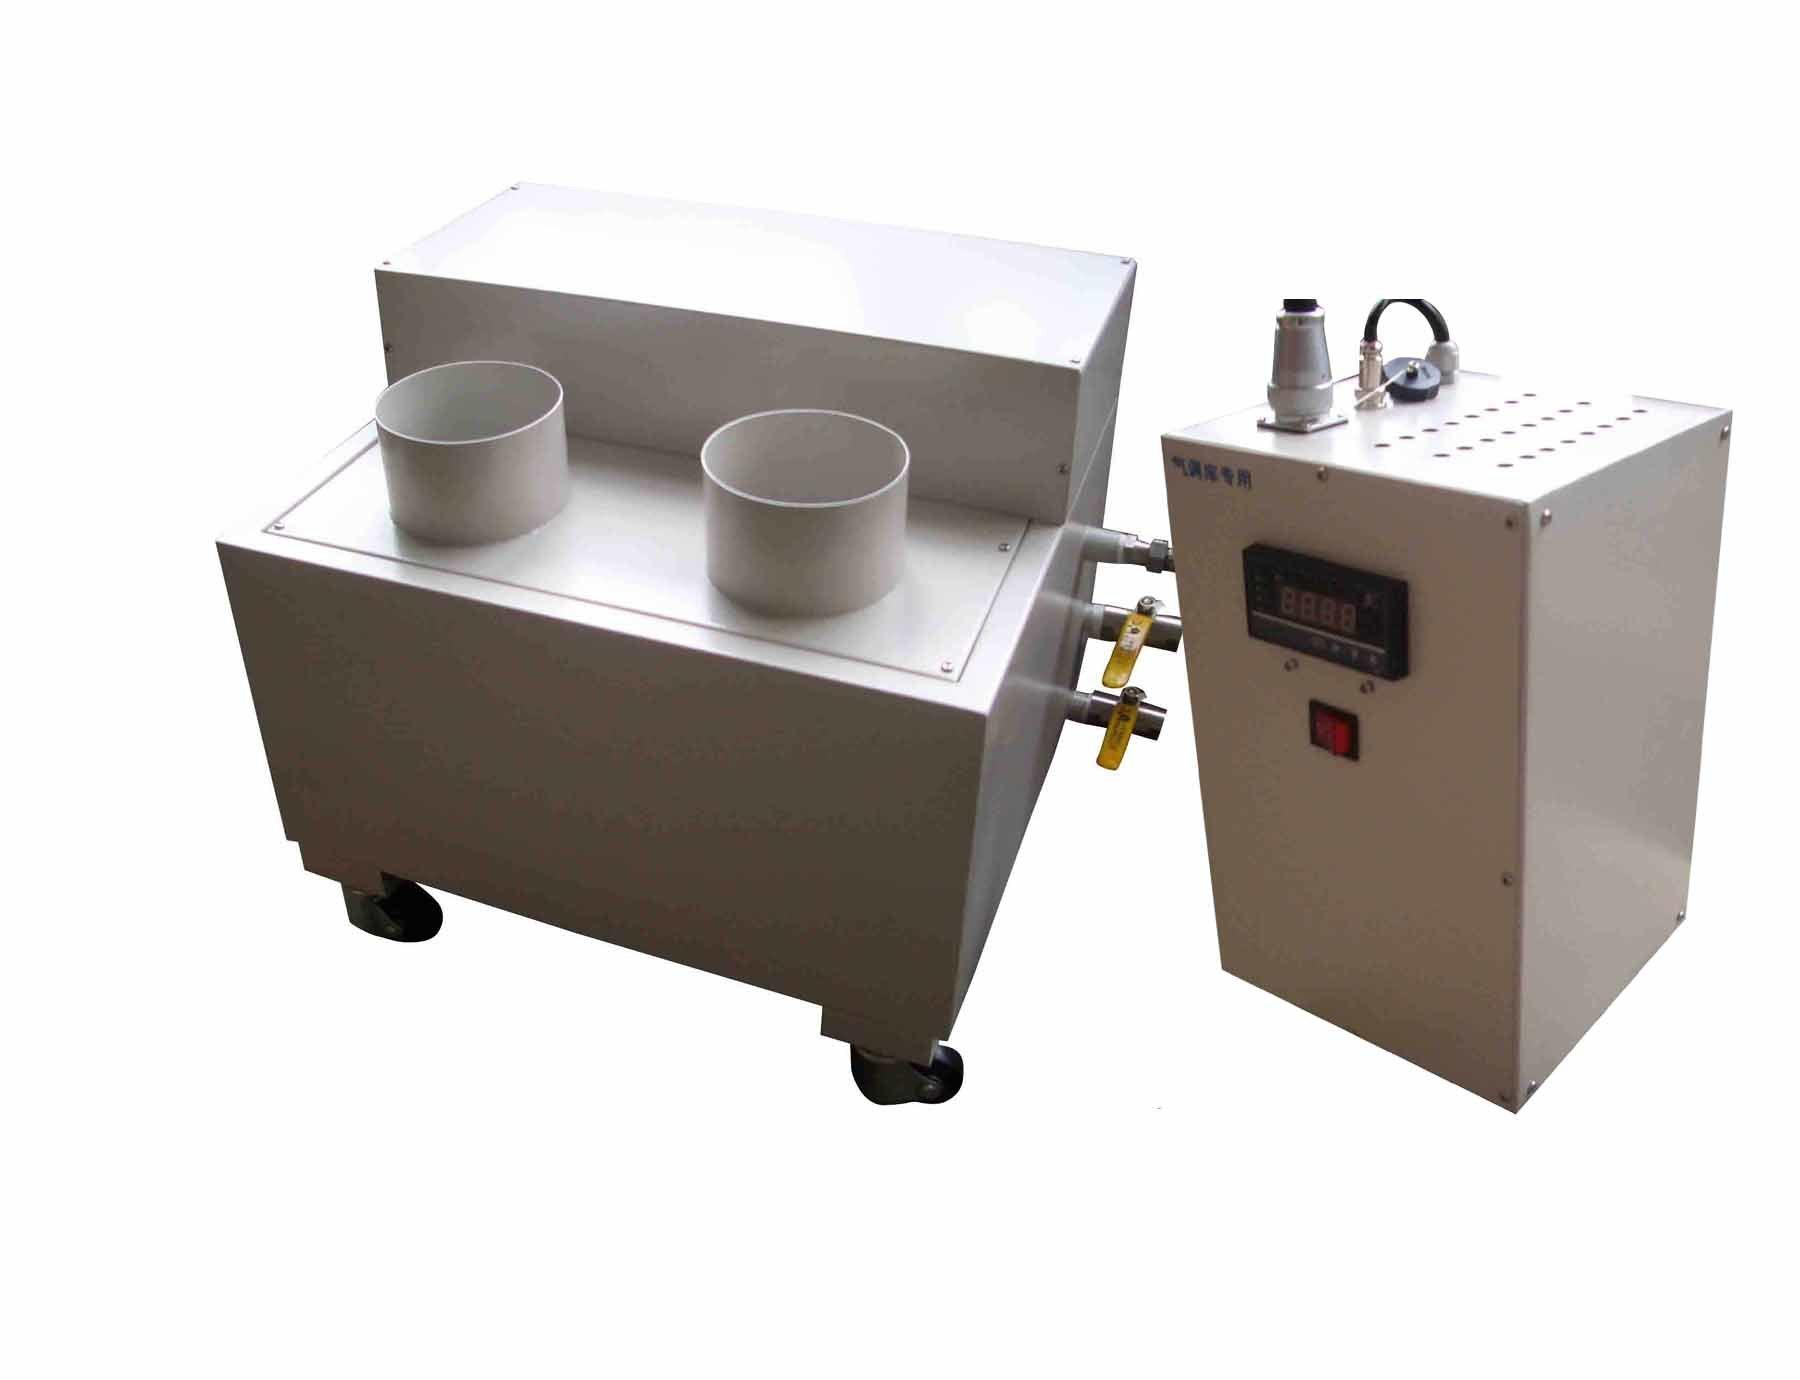 Humidifier (AOTE JS09Z) China Humidifier Industrial Humidifier #715E4D